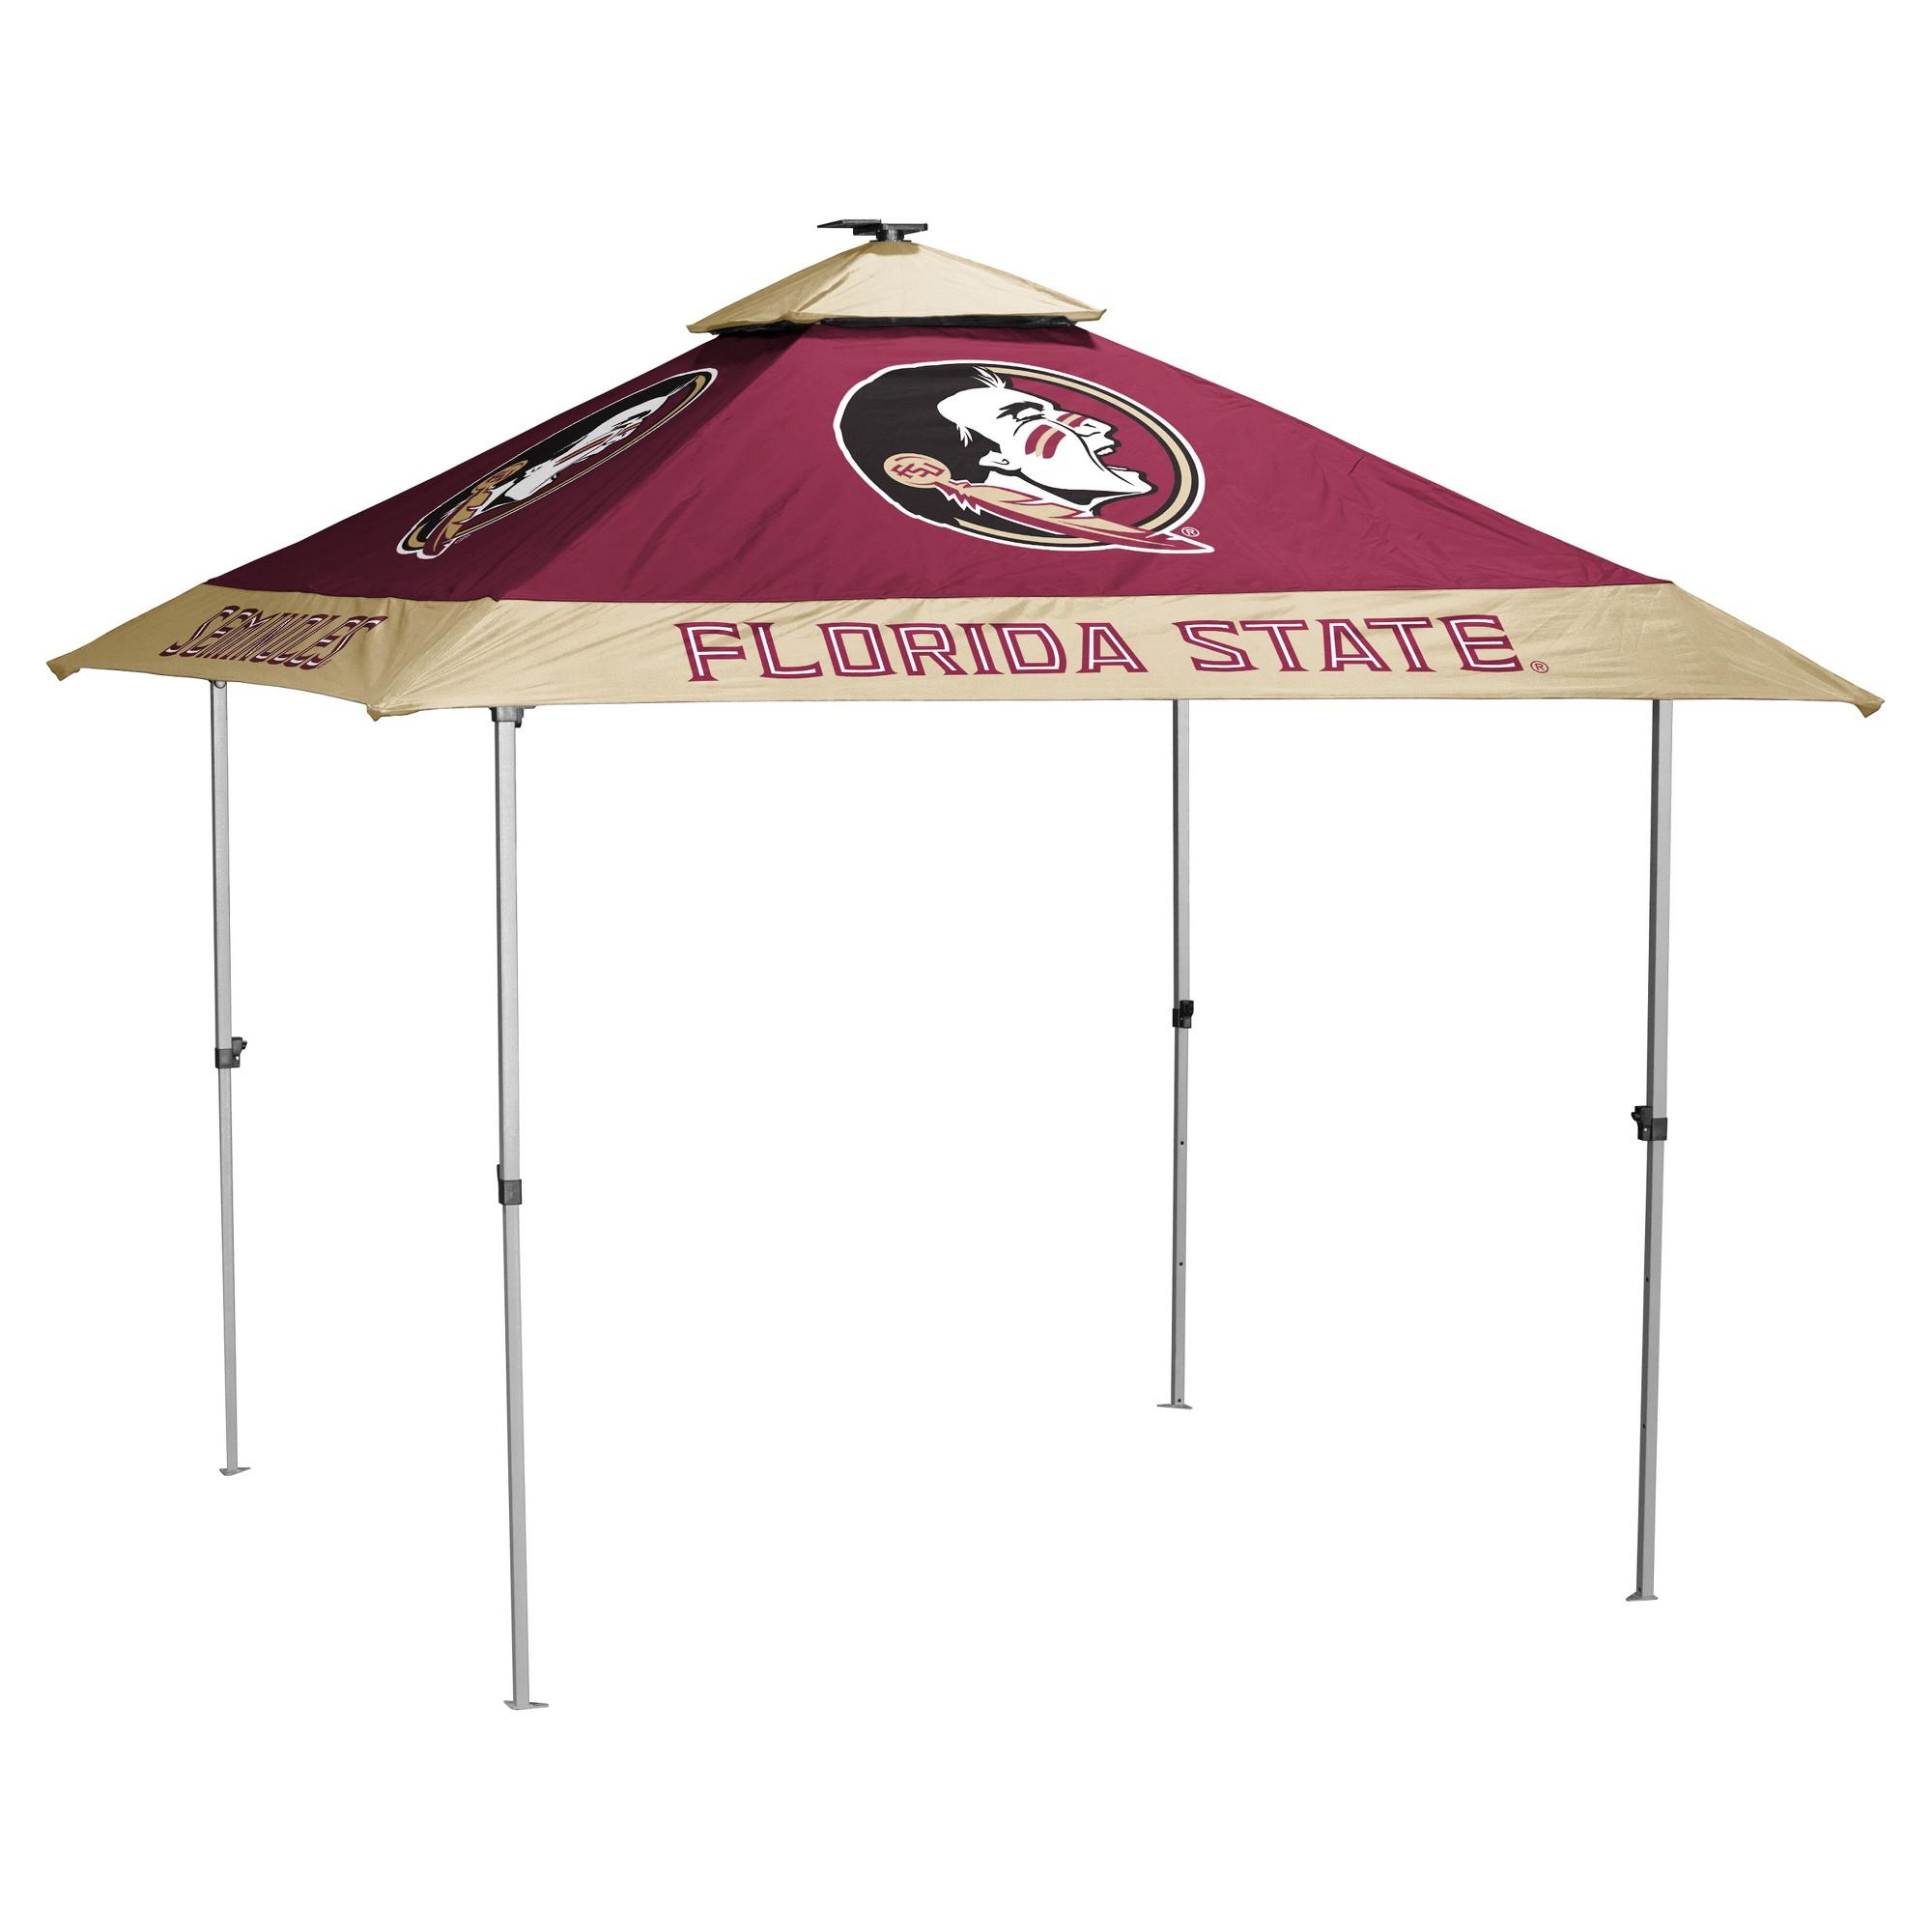 Ncaa Florida State Seminoles Logo Brands Pagoda 10x10